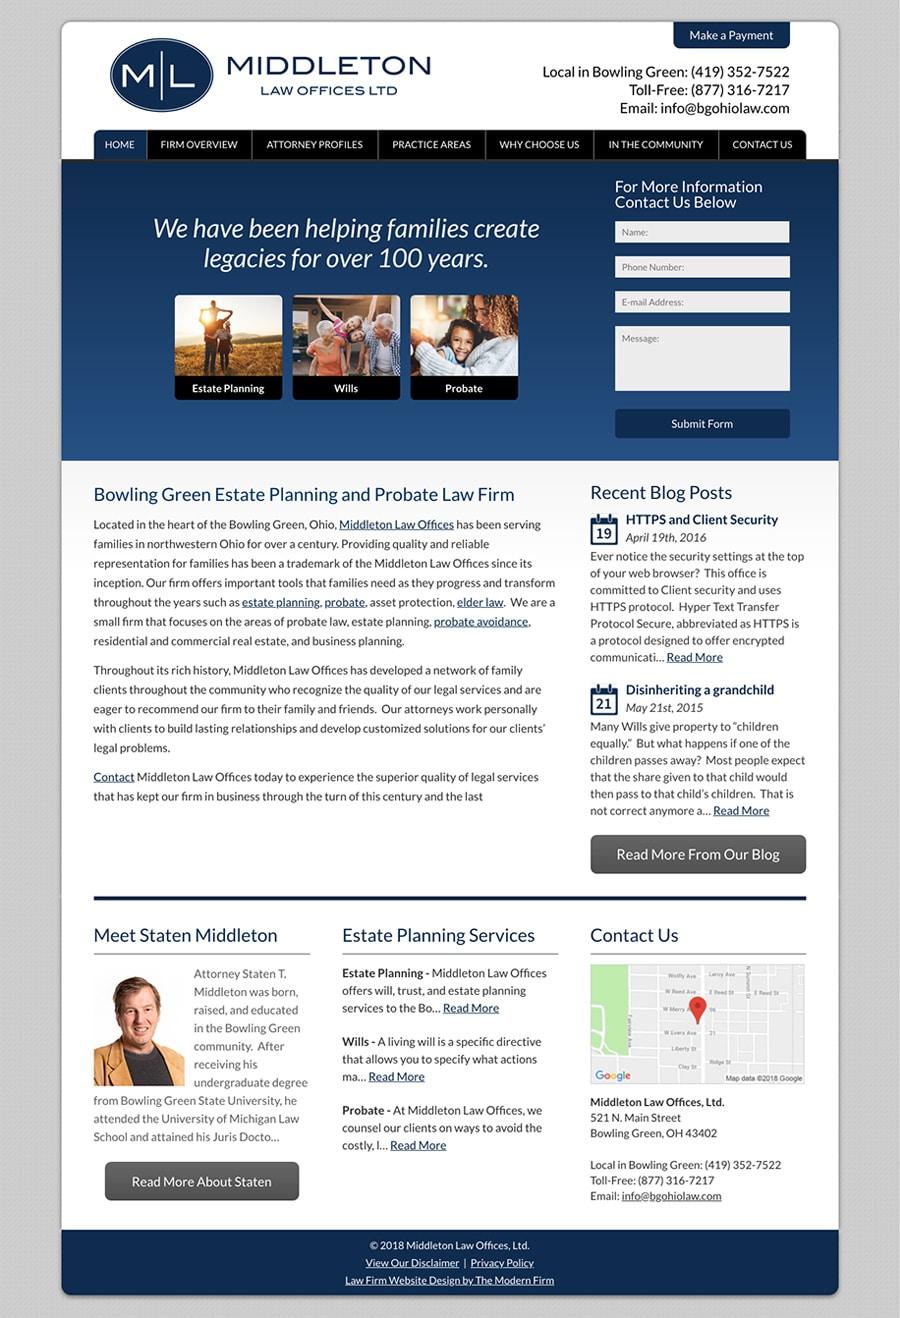 Law Firm Website Design for Middleton Law Offices, Ltd.